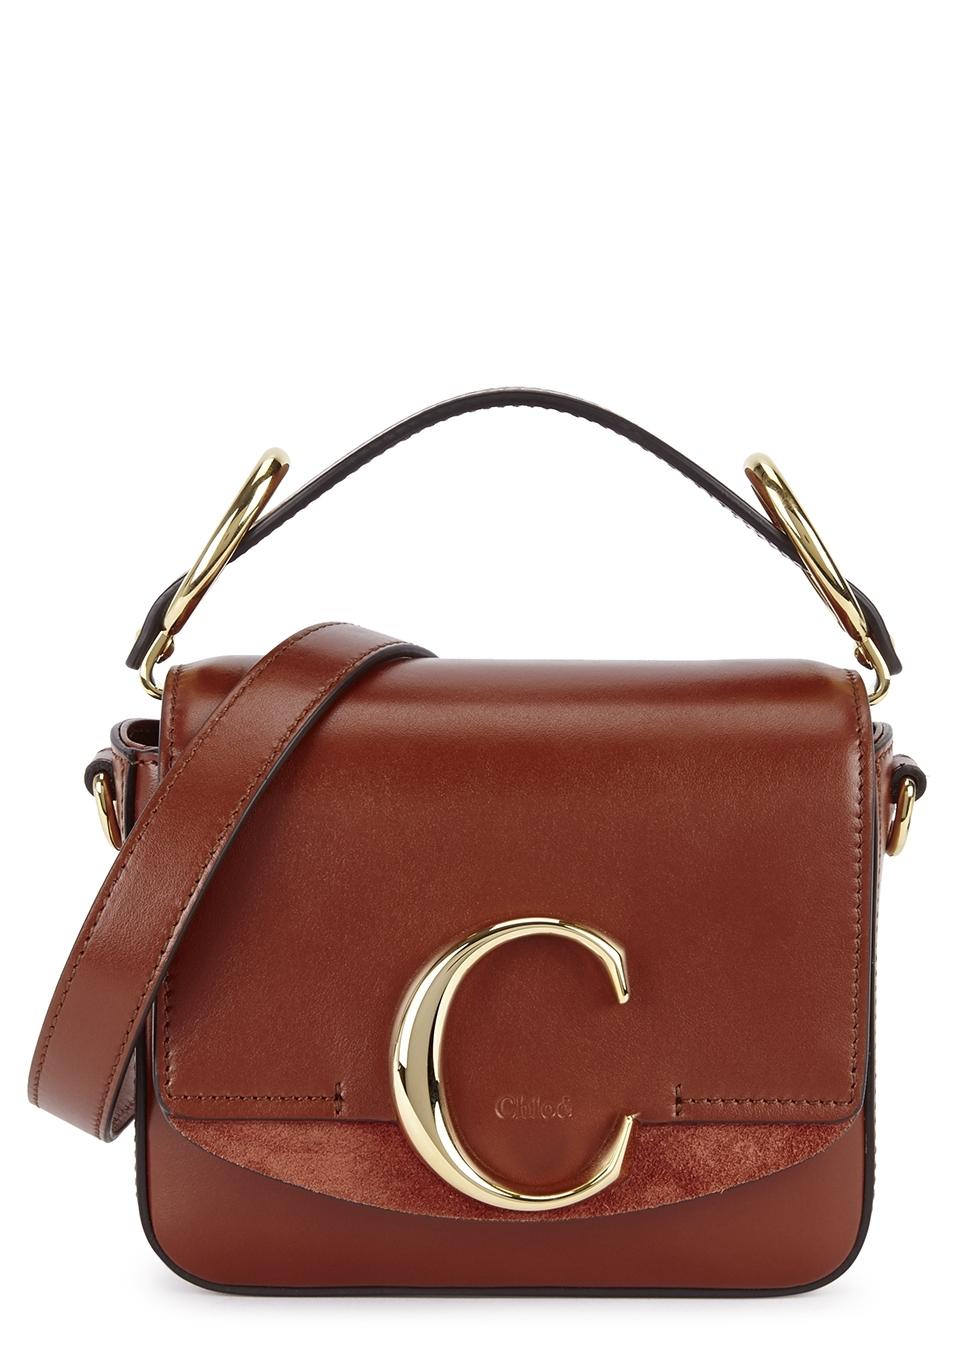 a555a0f850 Women s Designer Bags